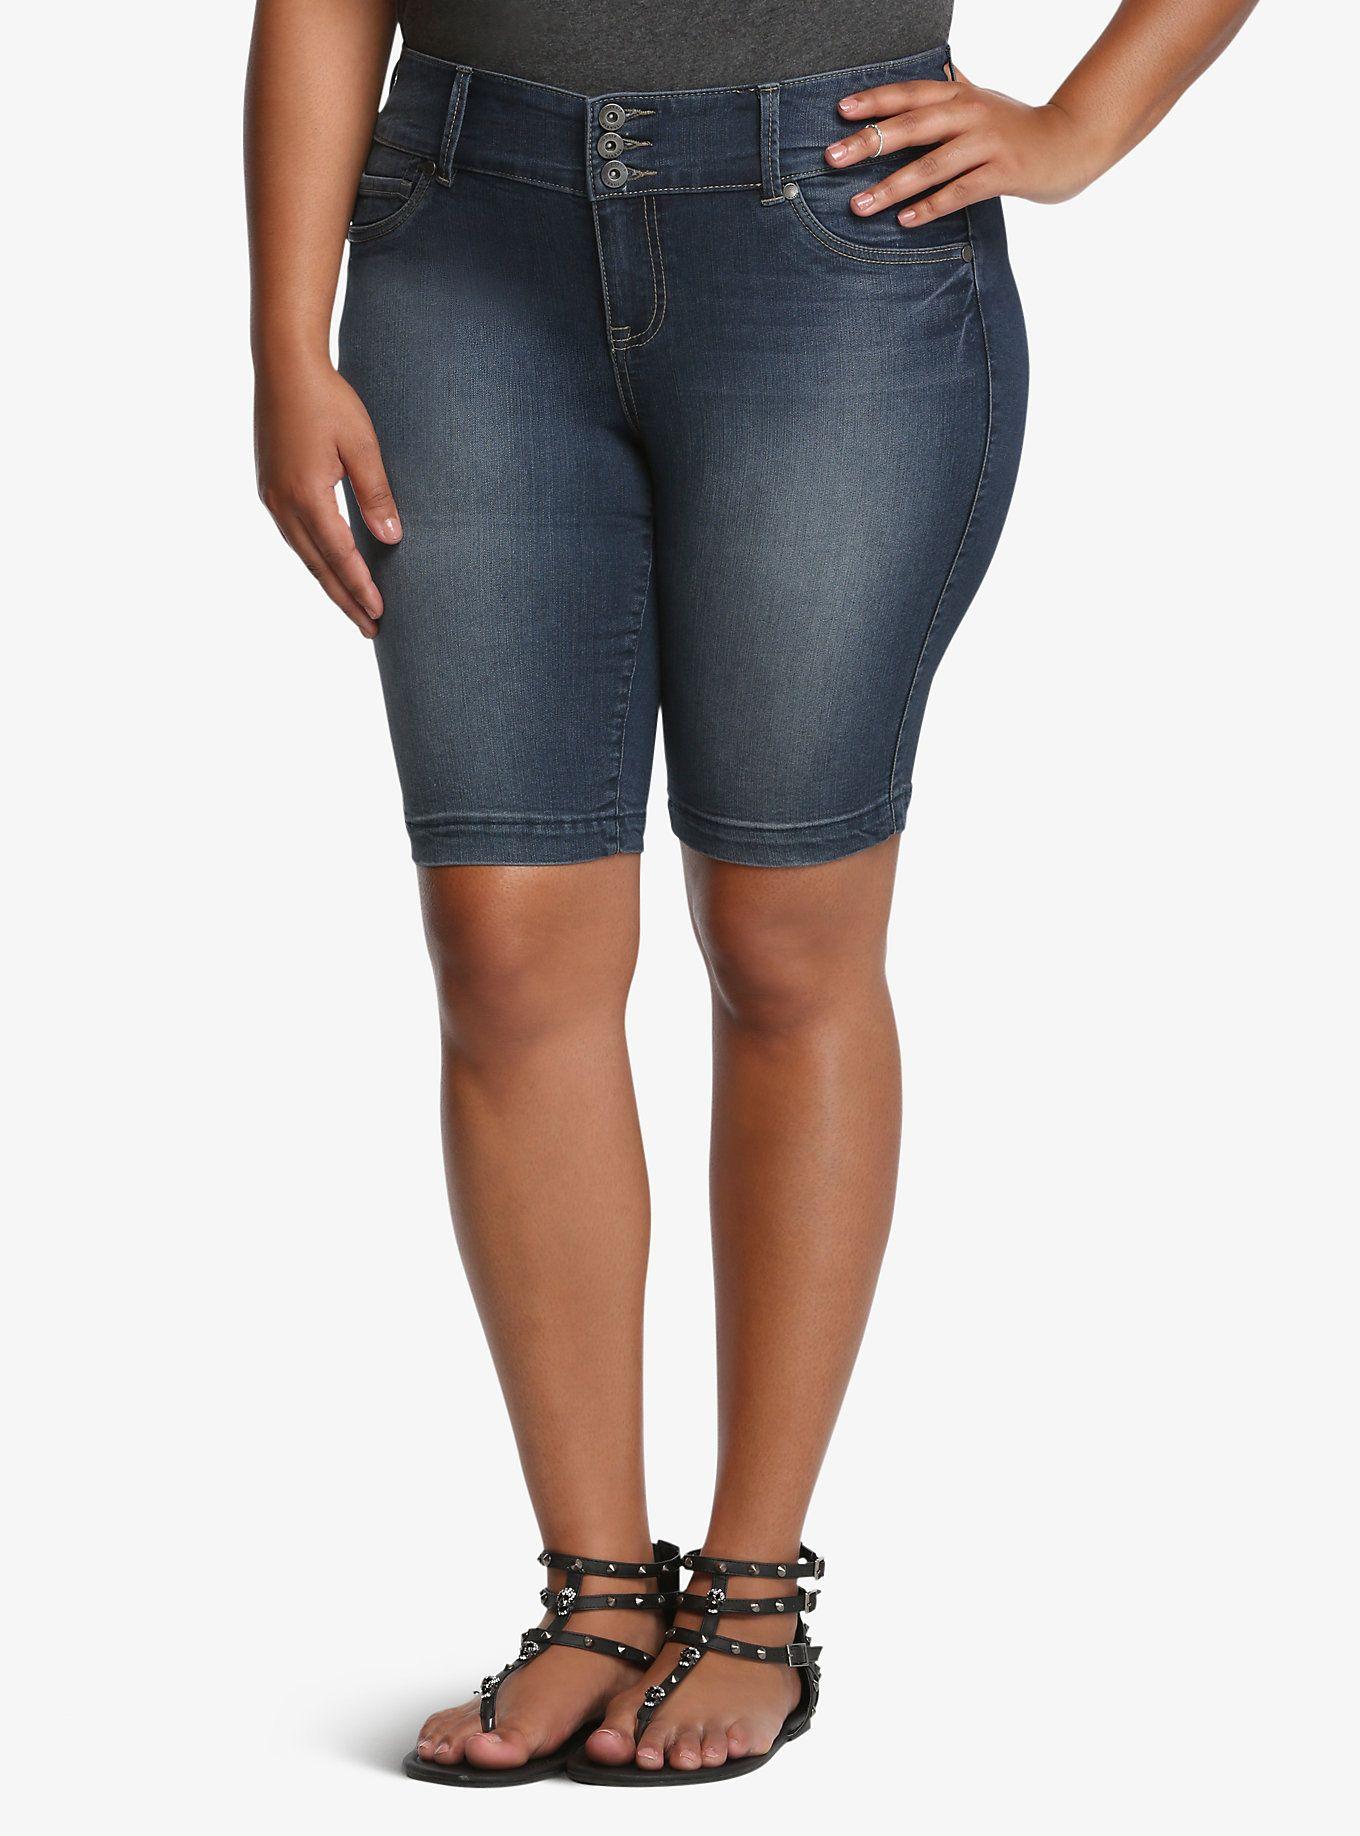 23c6badcf7 Jegging Bermuda Shorts - Medium Wash | Fashion I like | Bermuda ...